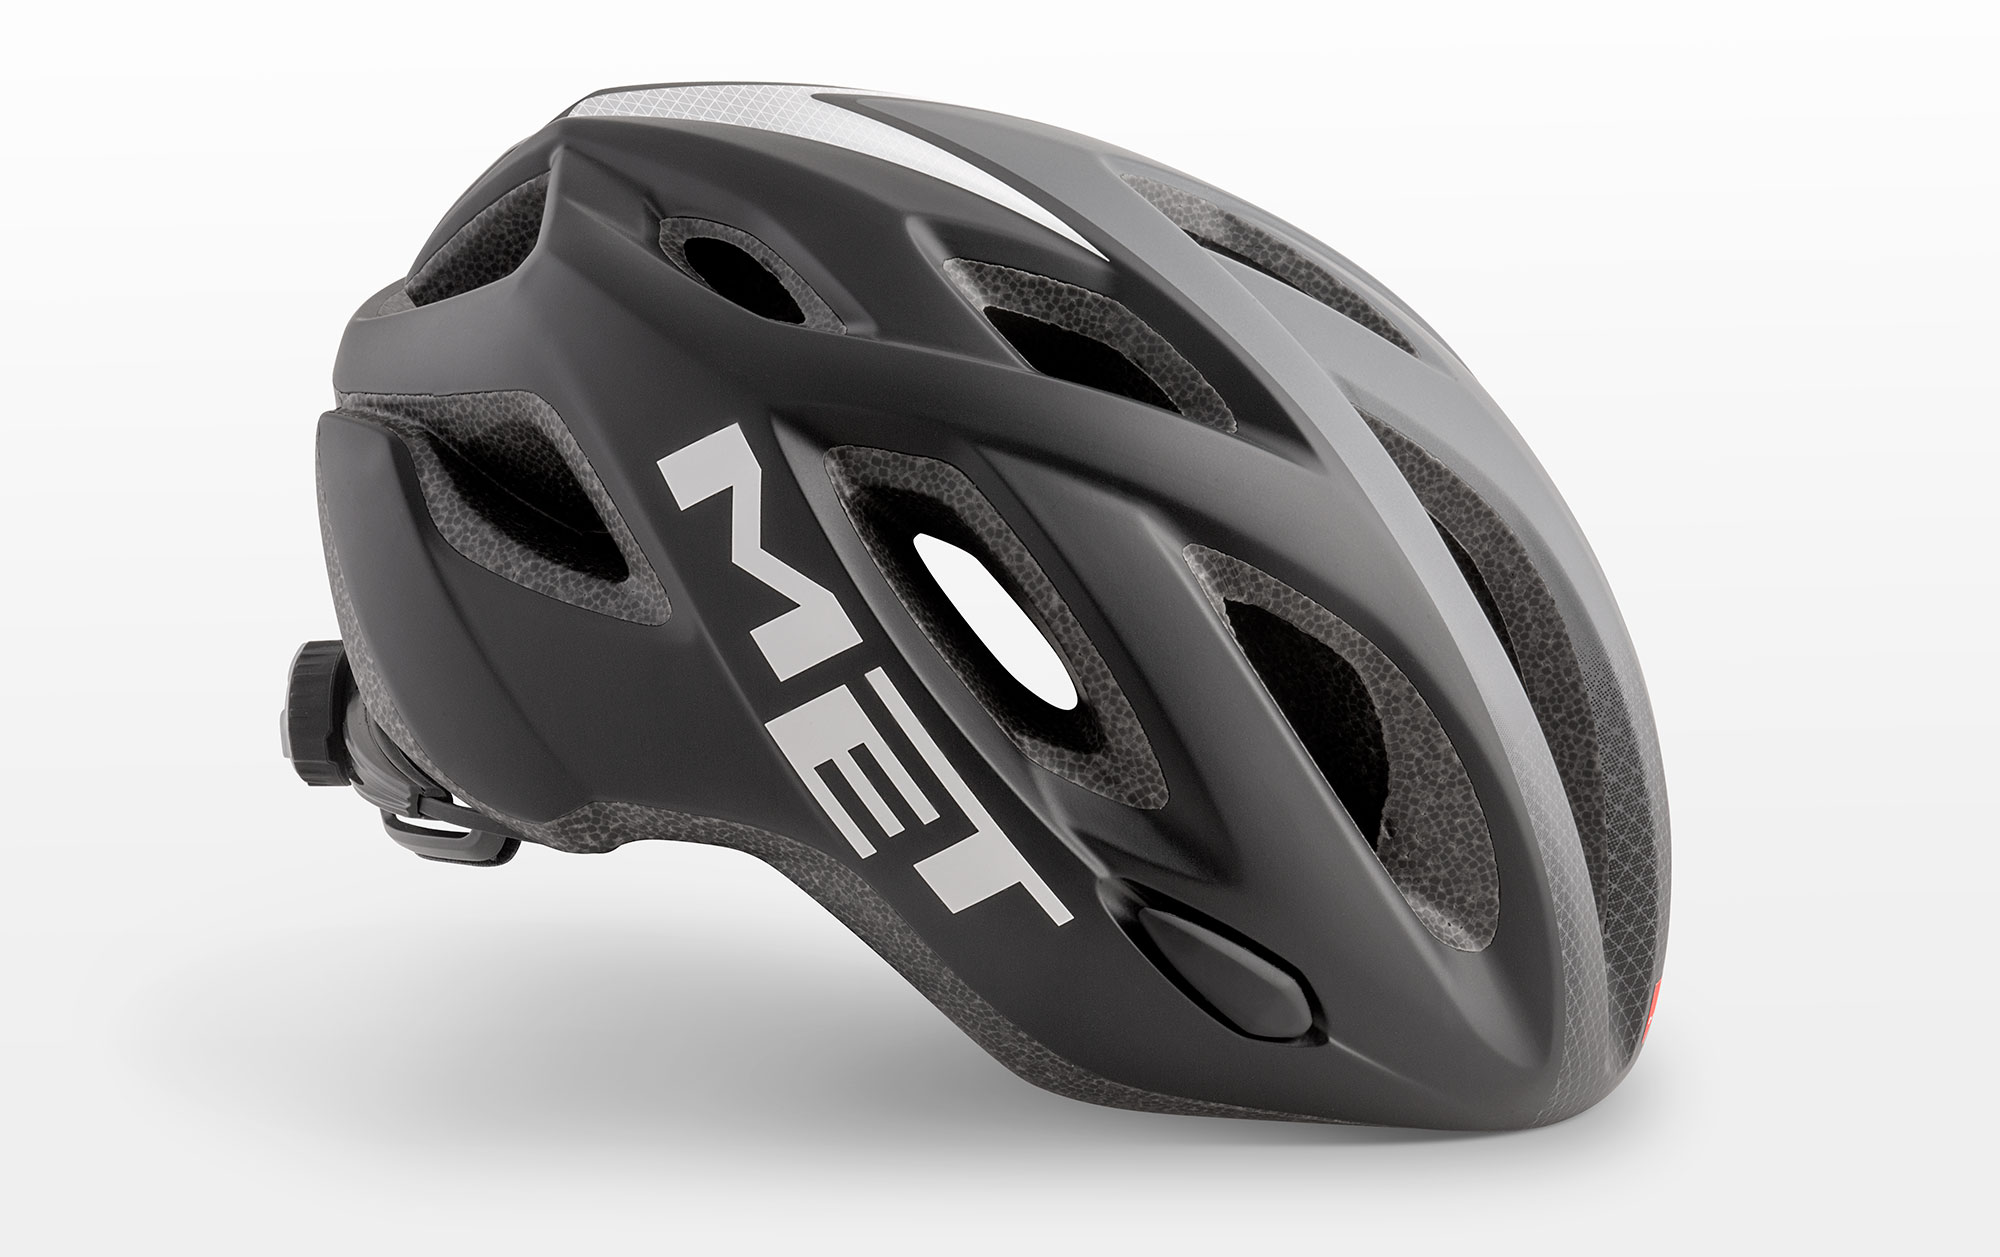 MET Idolo Road Helmet XL size